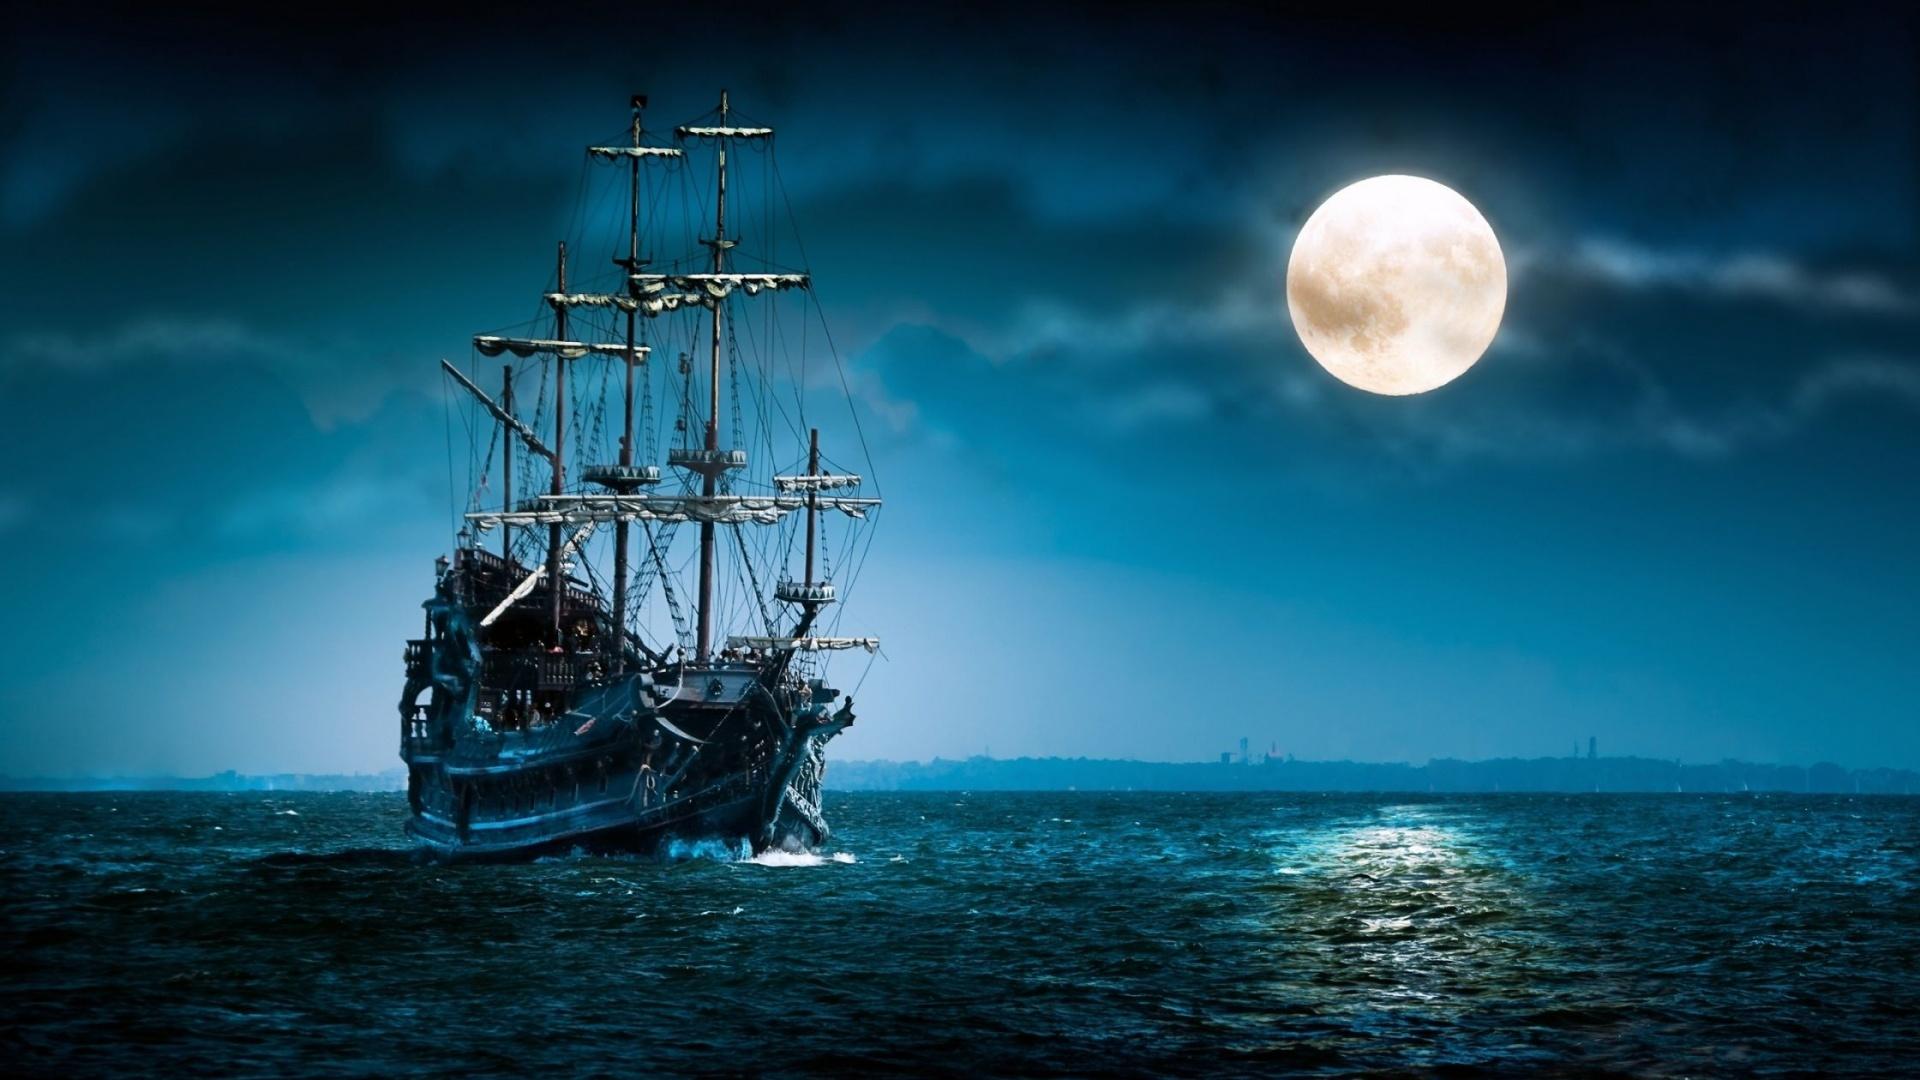 Boat in night photo